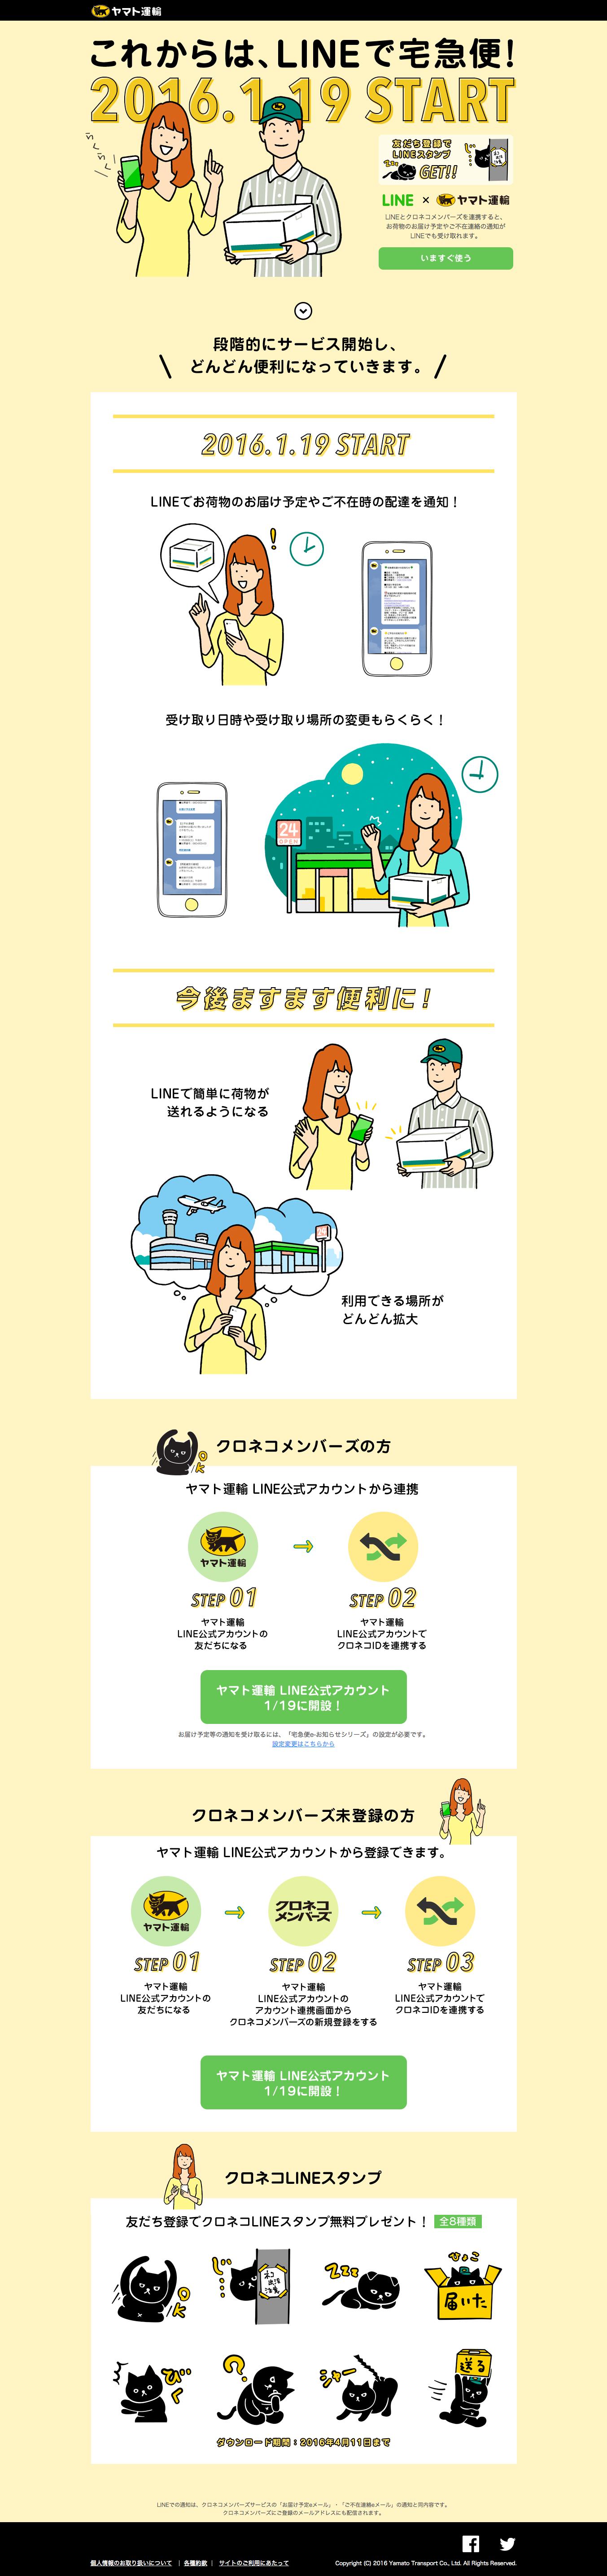 Http Www Kuronekoyamato Co Jp Campaign Renkei Line Ecommerce Web Design Web Design Web Design Inspiration